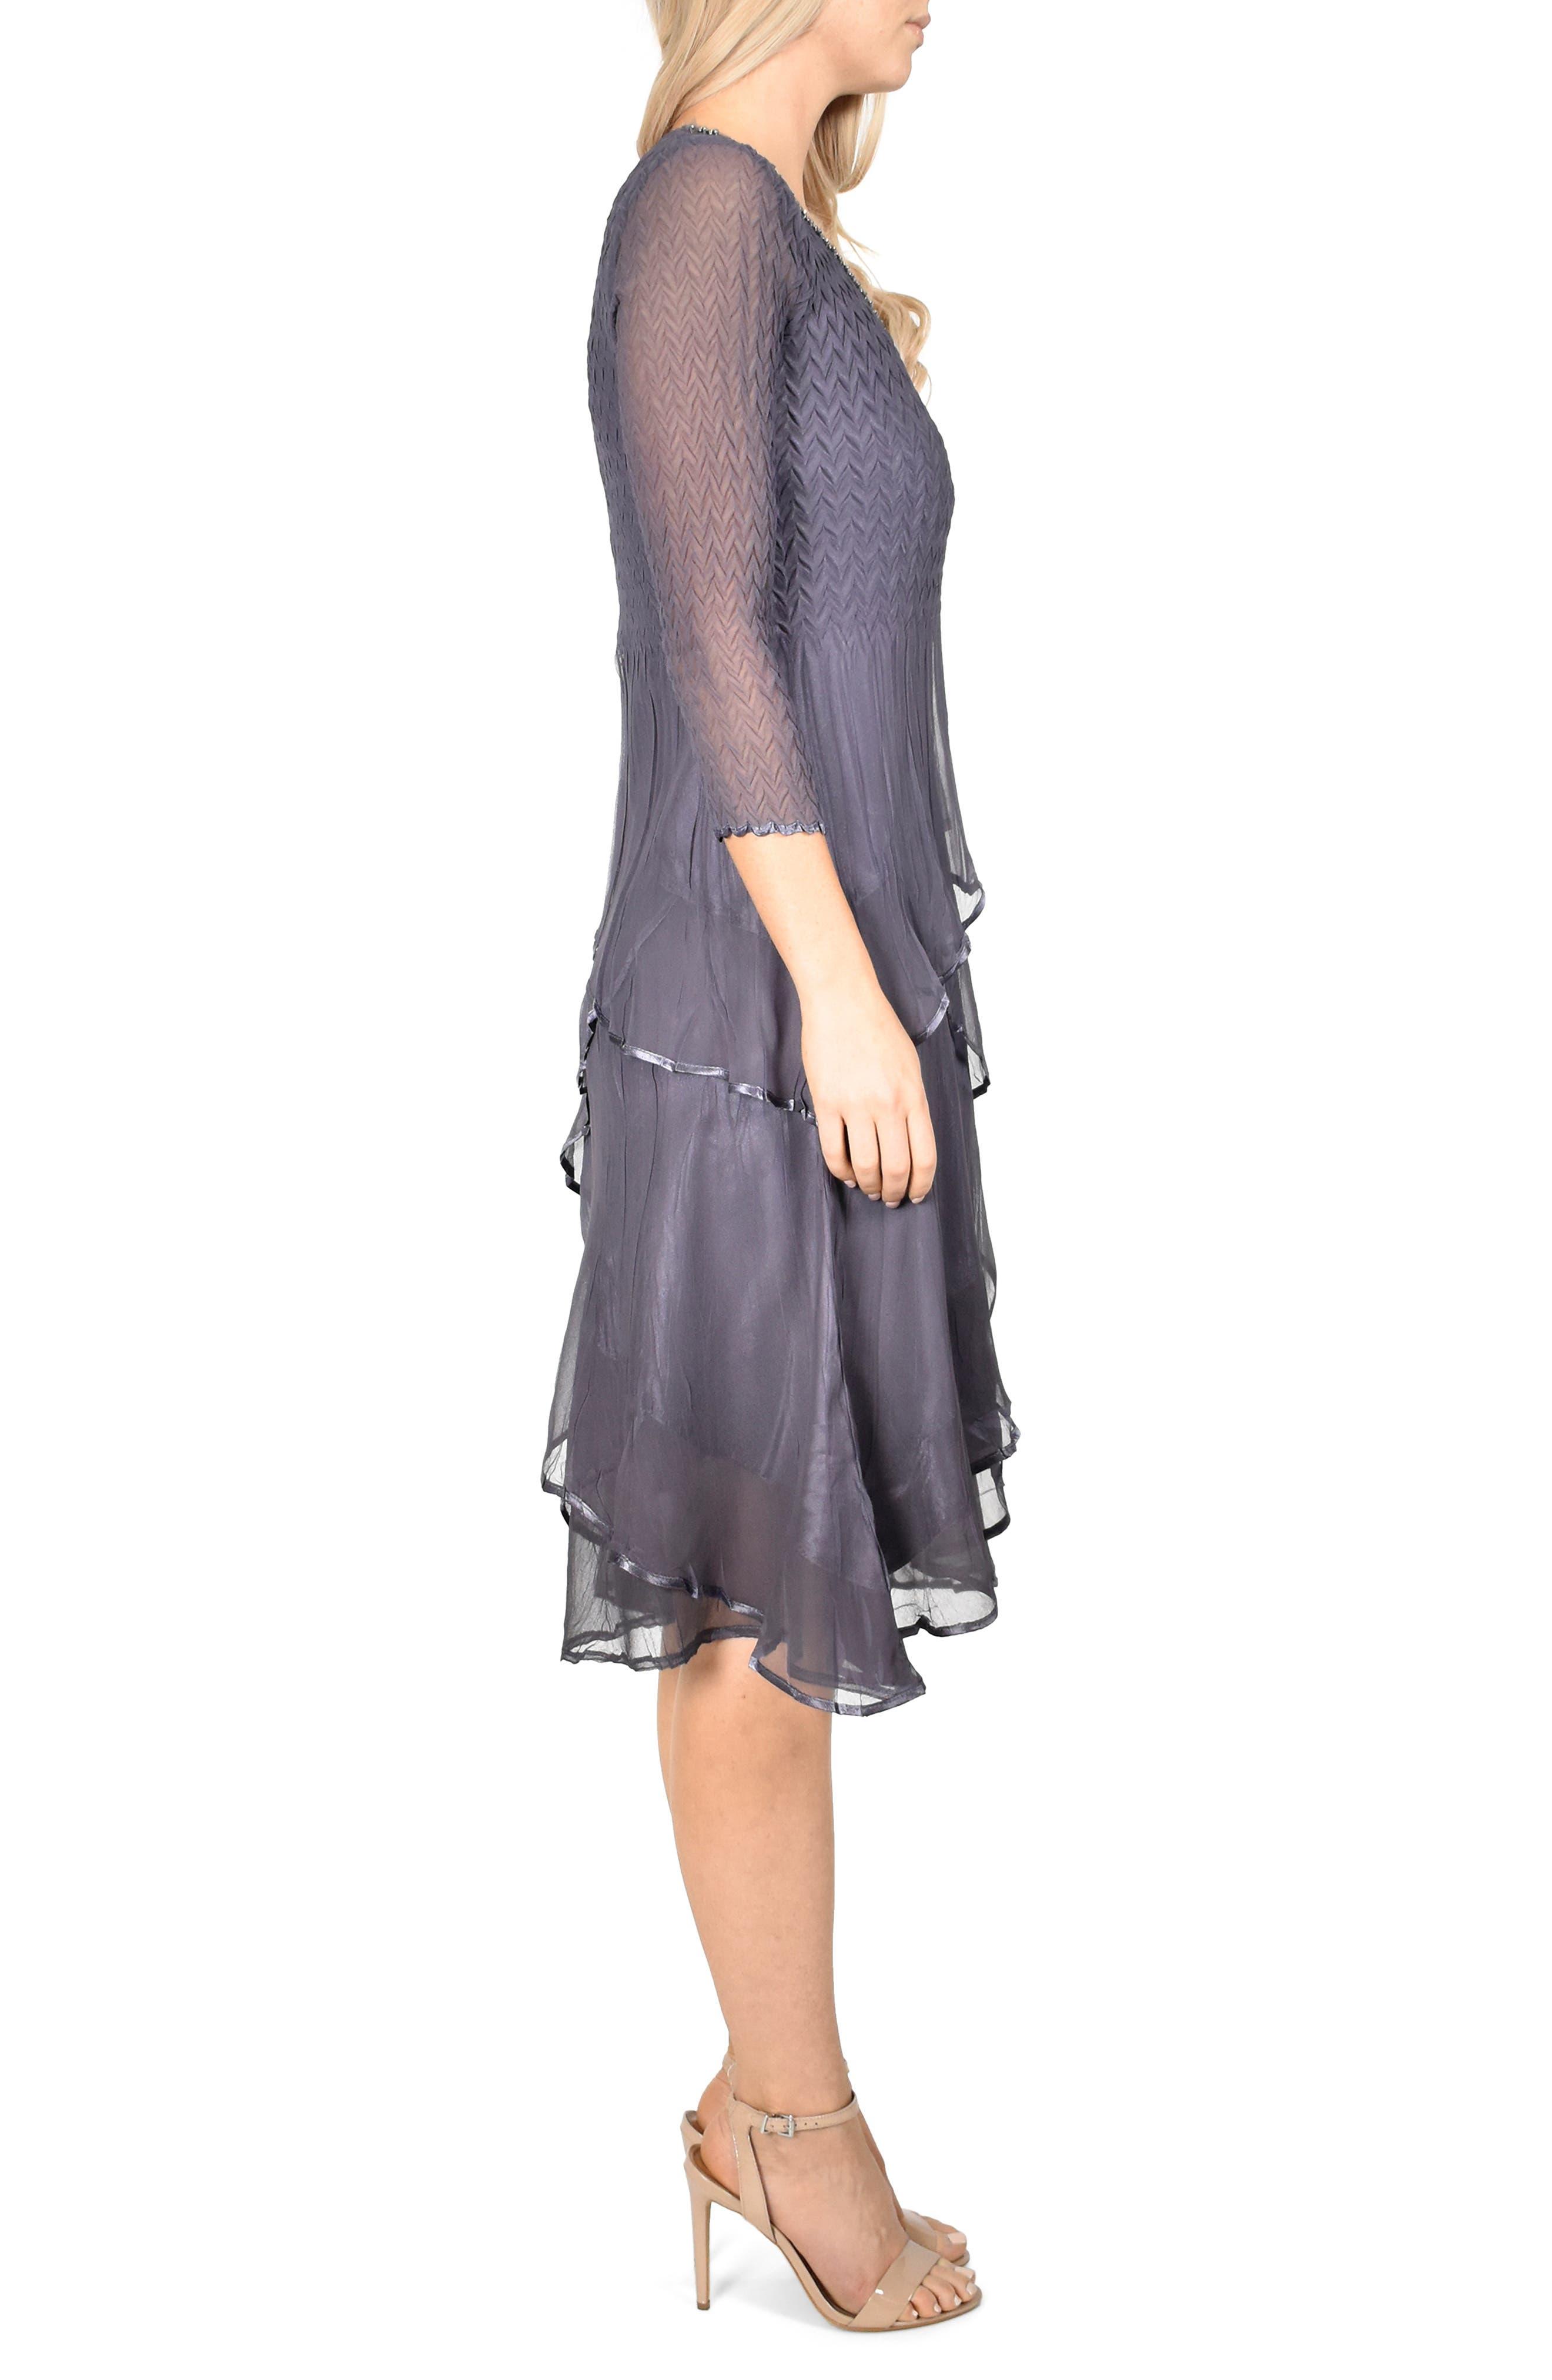 KOMAROV, Tiered Hem Dress, Alternate thumbnail 4, color, 500